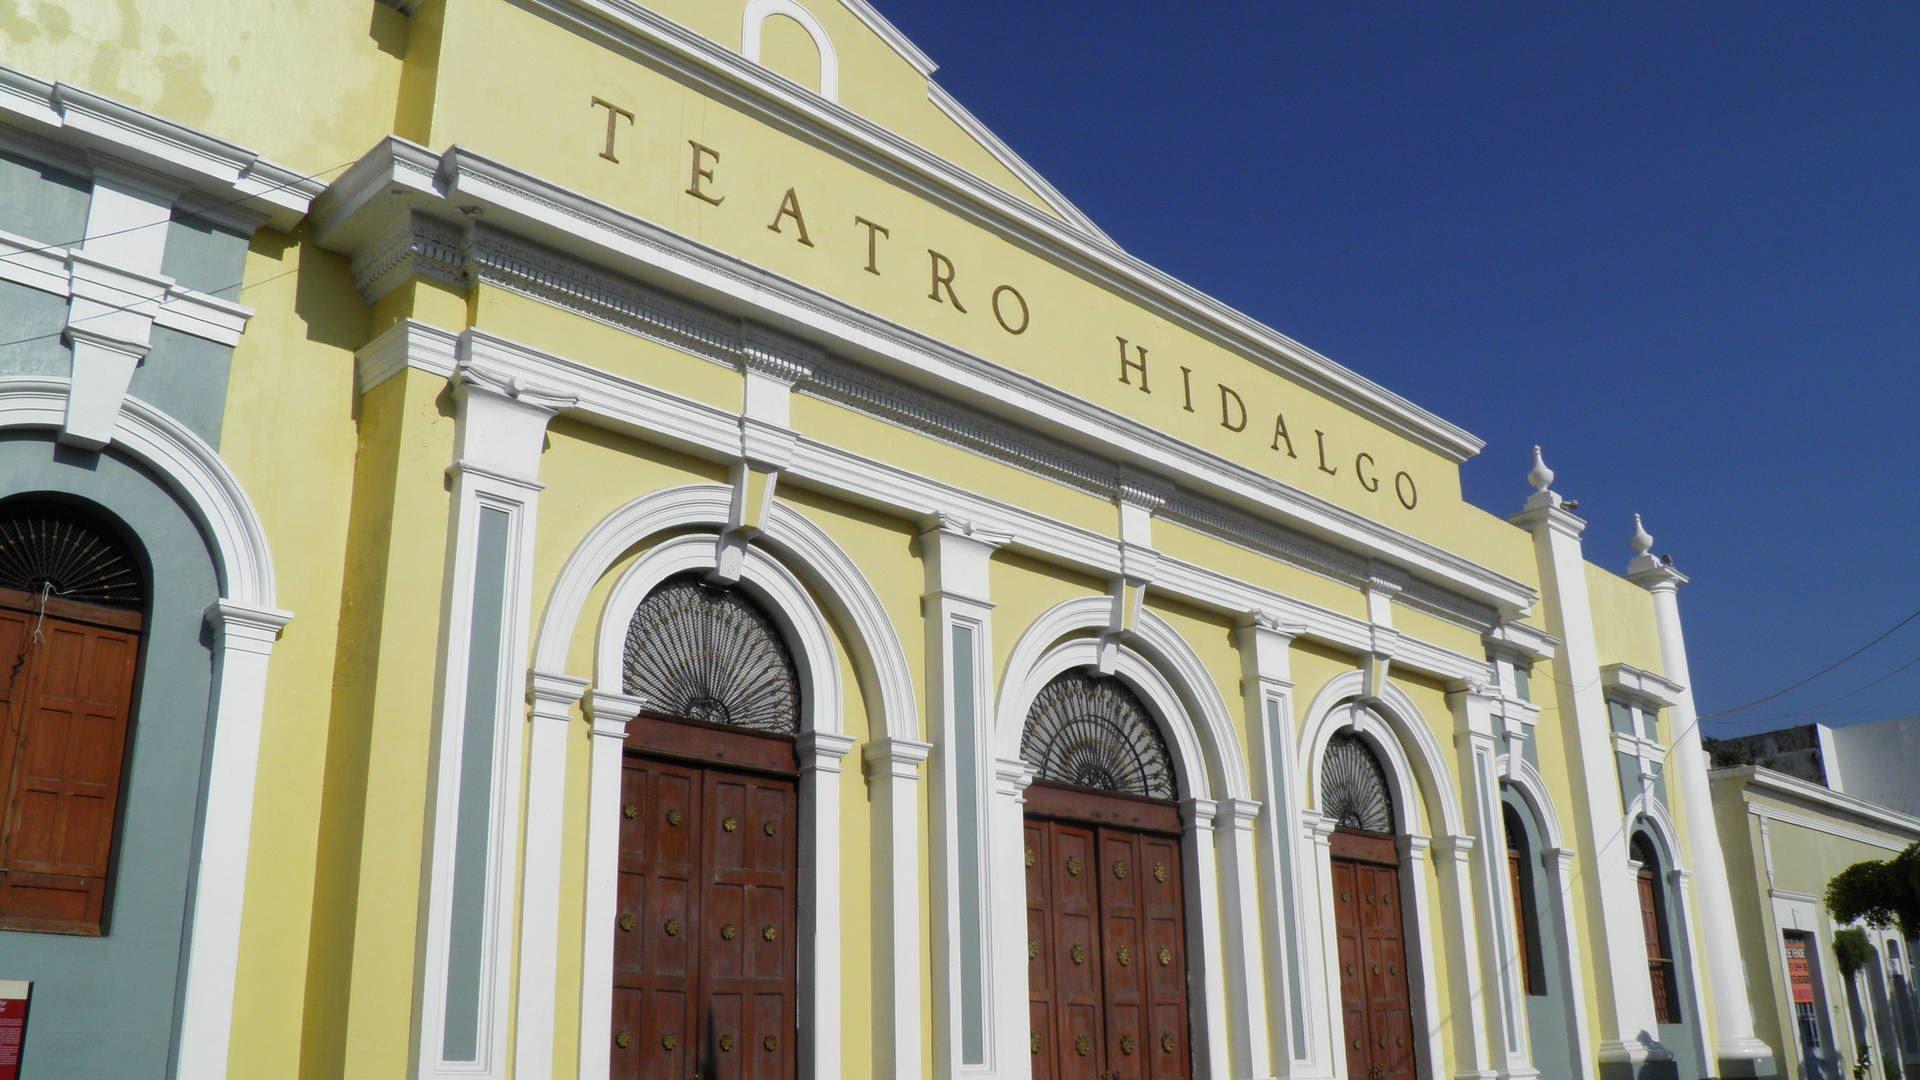 Teatro Hidalgo